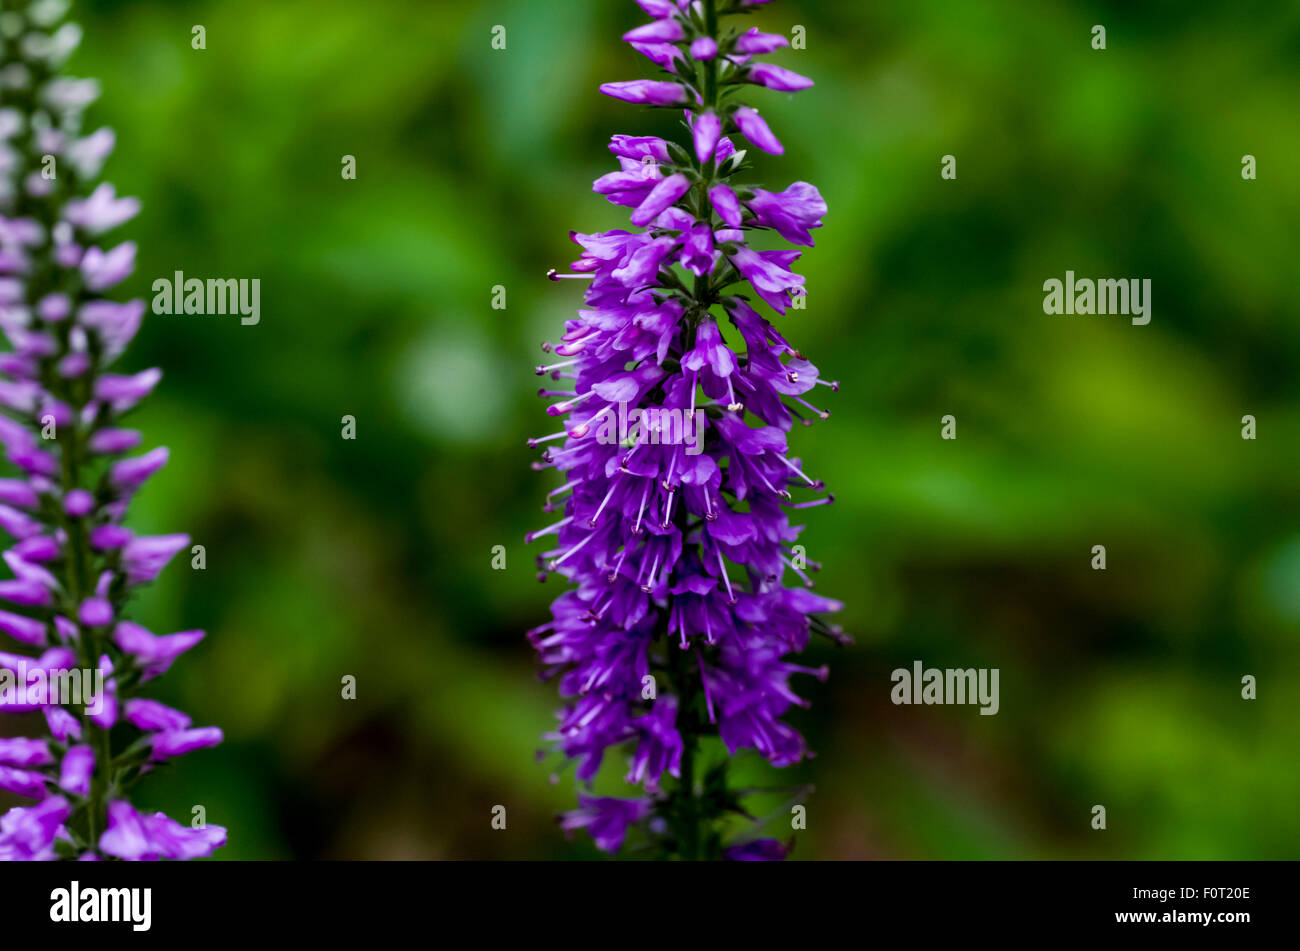 Obedient Plant/False Dragonhead (Physostegia virginiana) - Stock Image